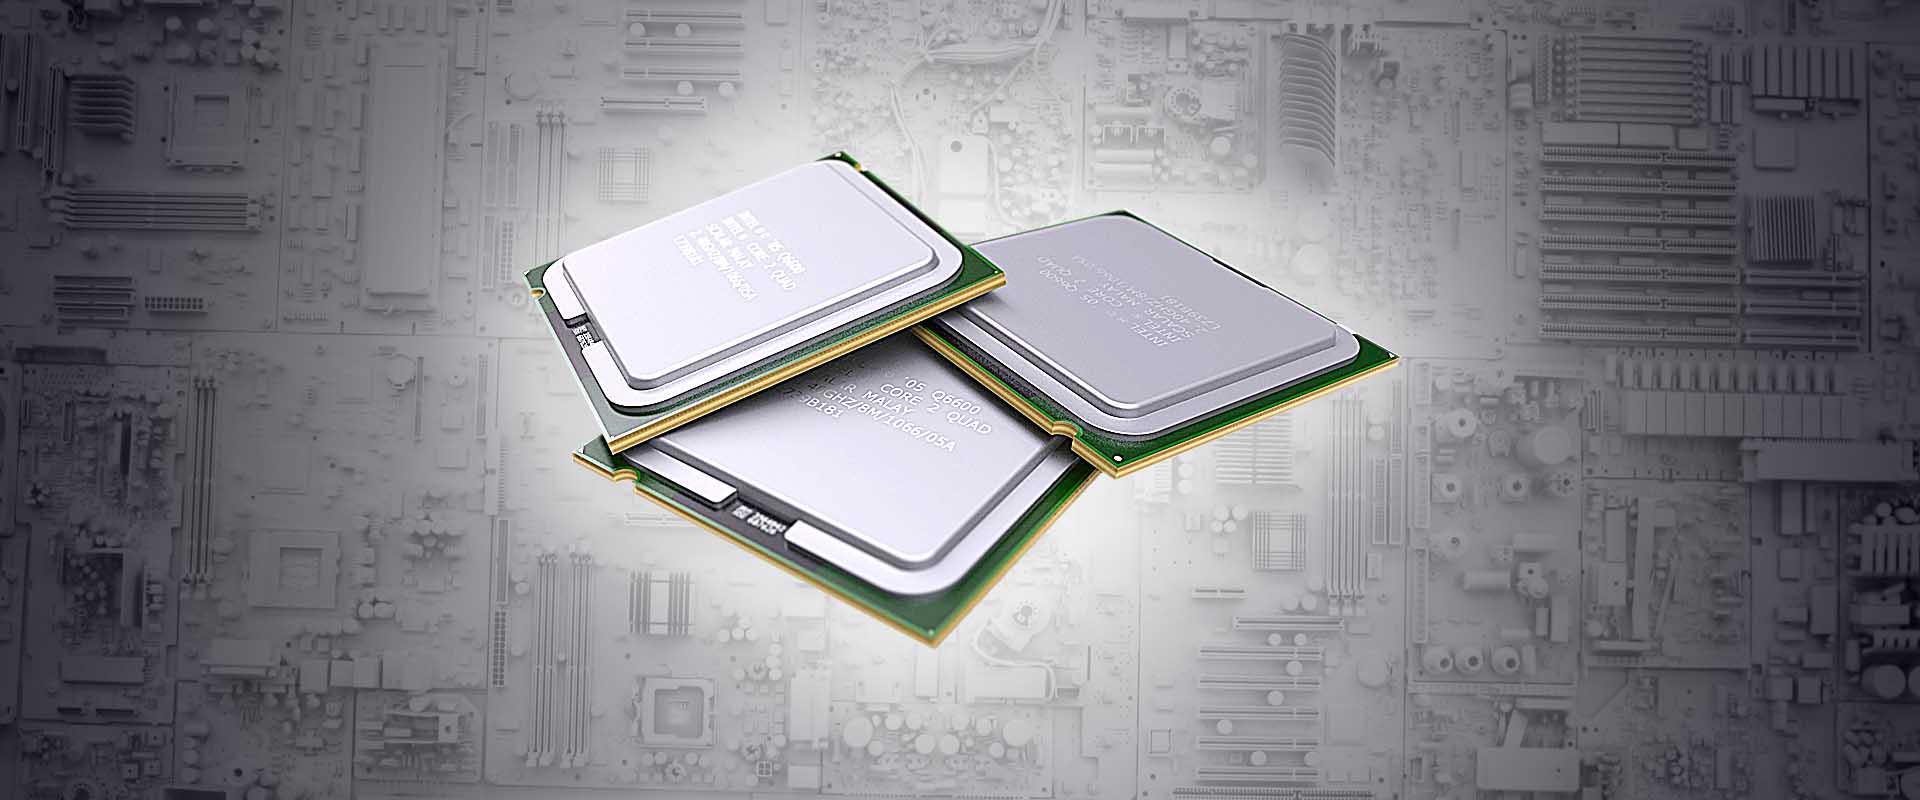 CPU #3 intel sebezhetőség ☠️ ⚡